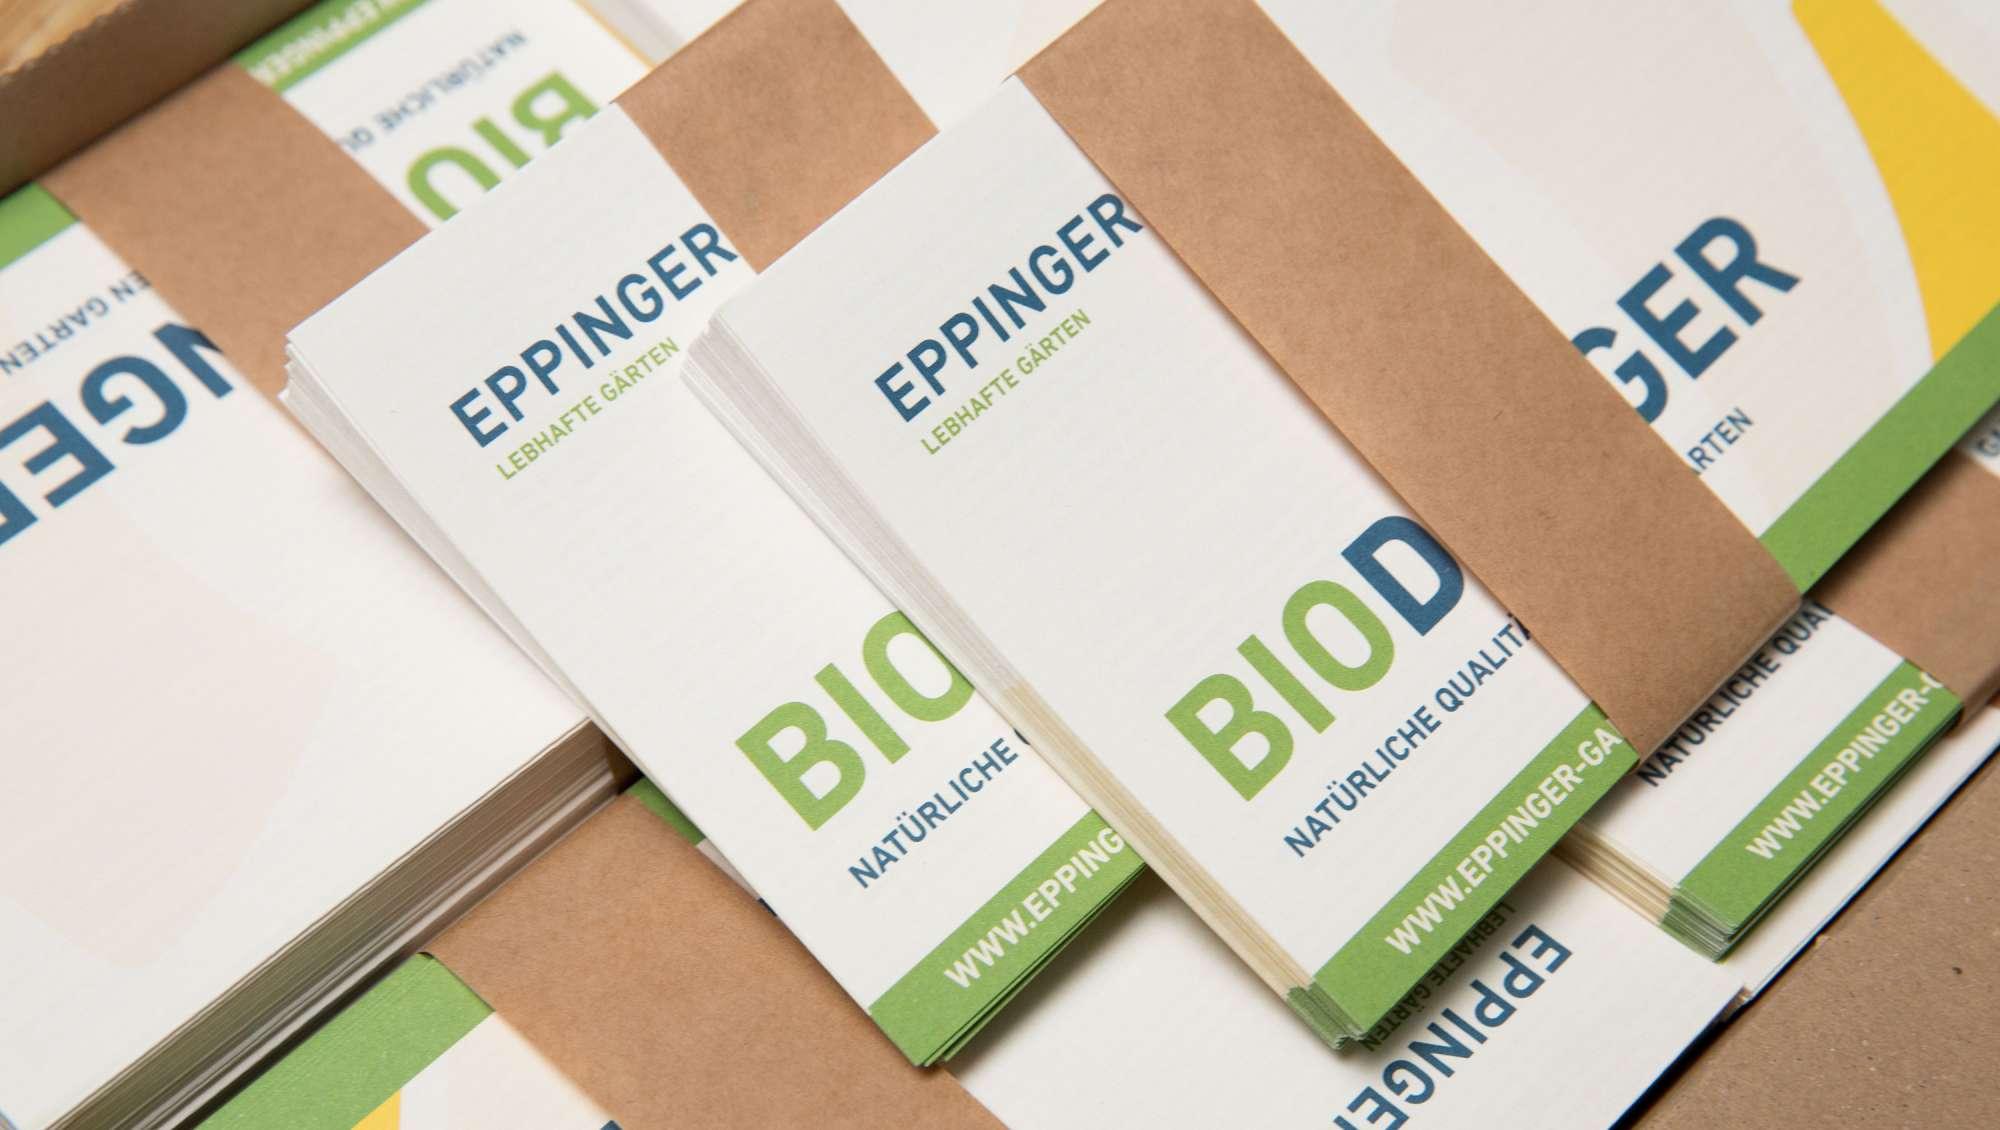 Produktdesign, Packaging Design, Entwicklung Produkt und Angebotsstruktur